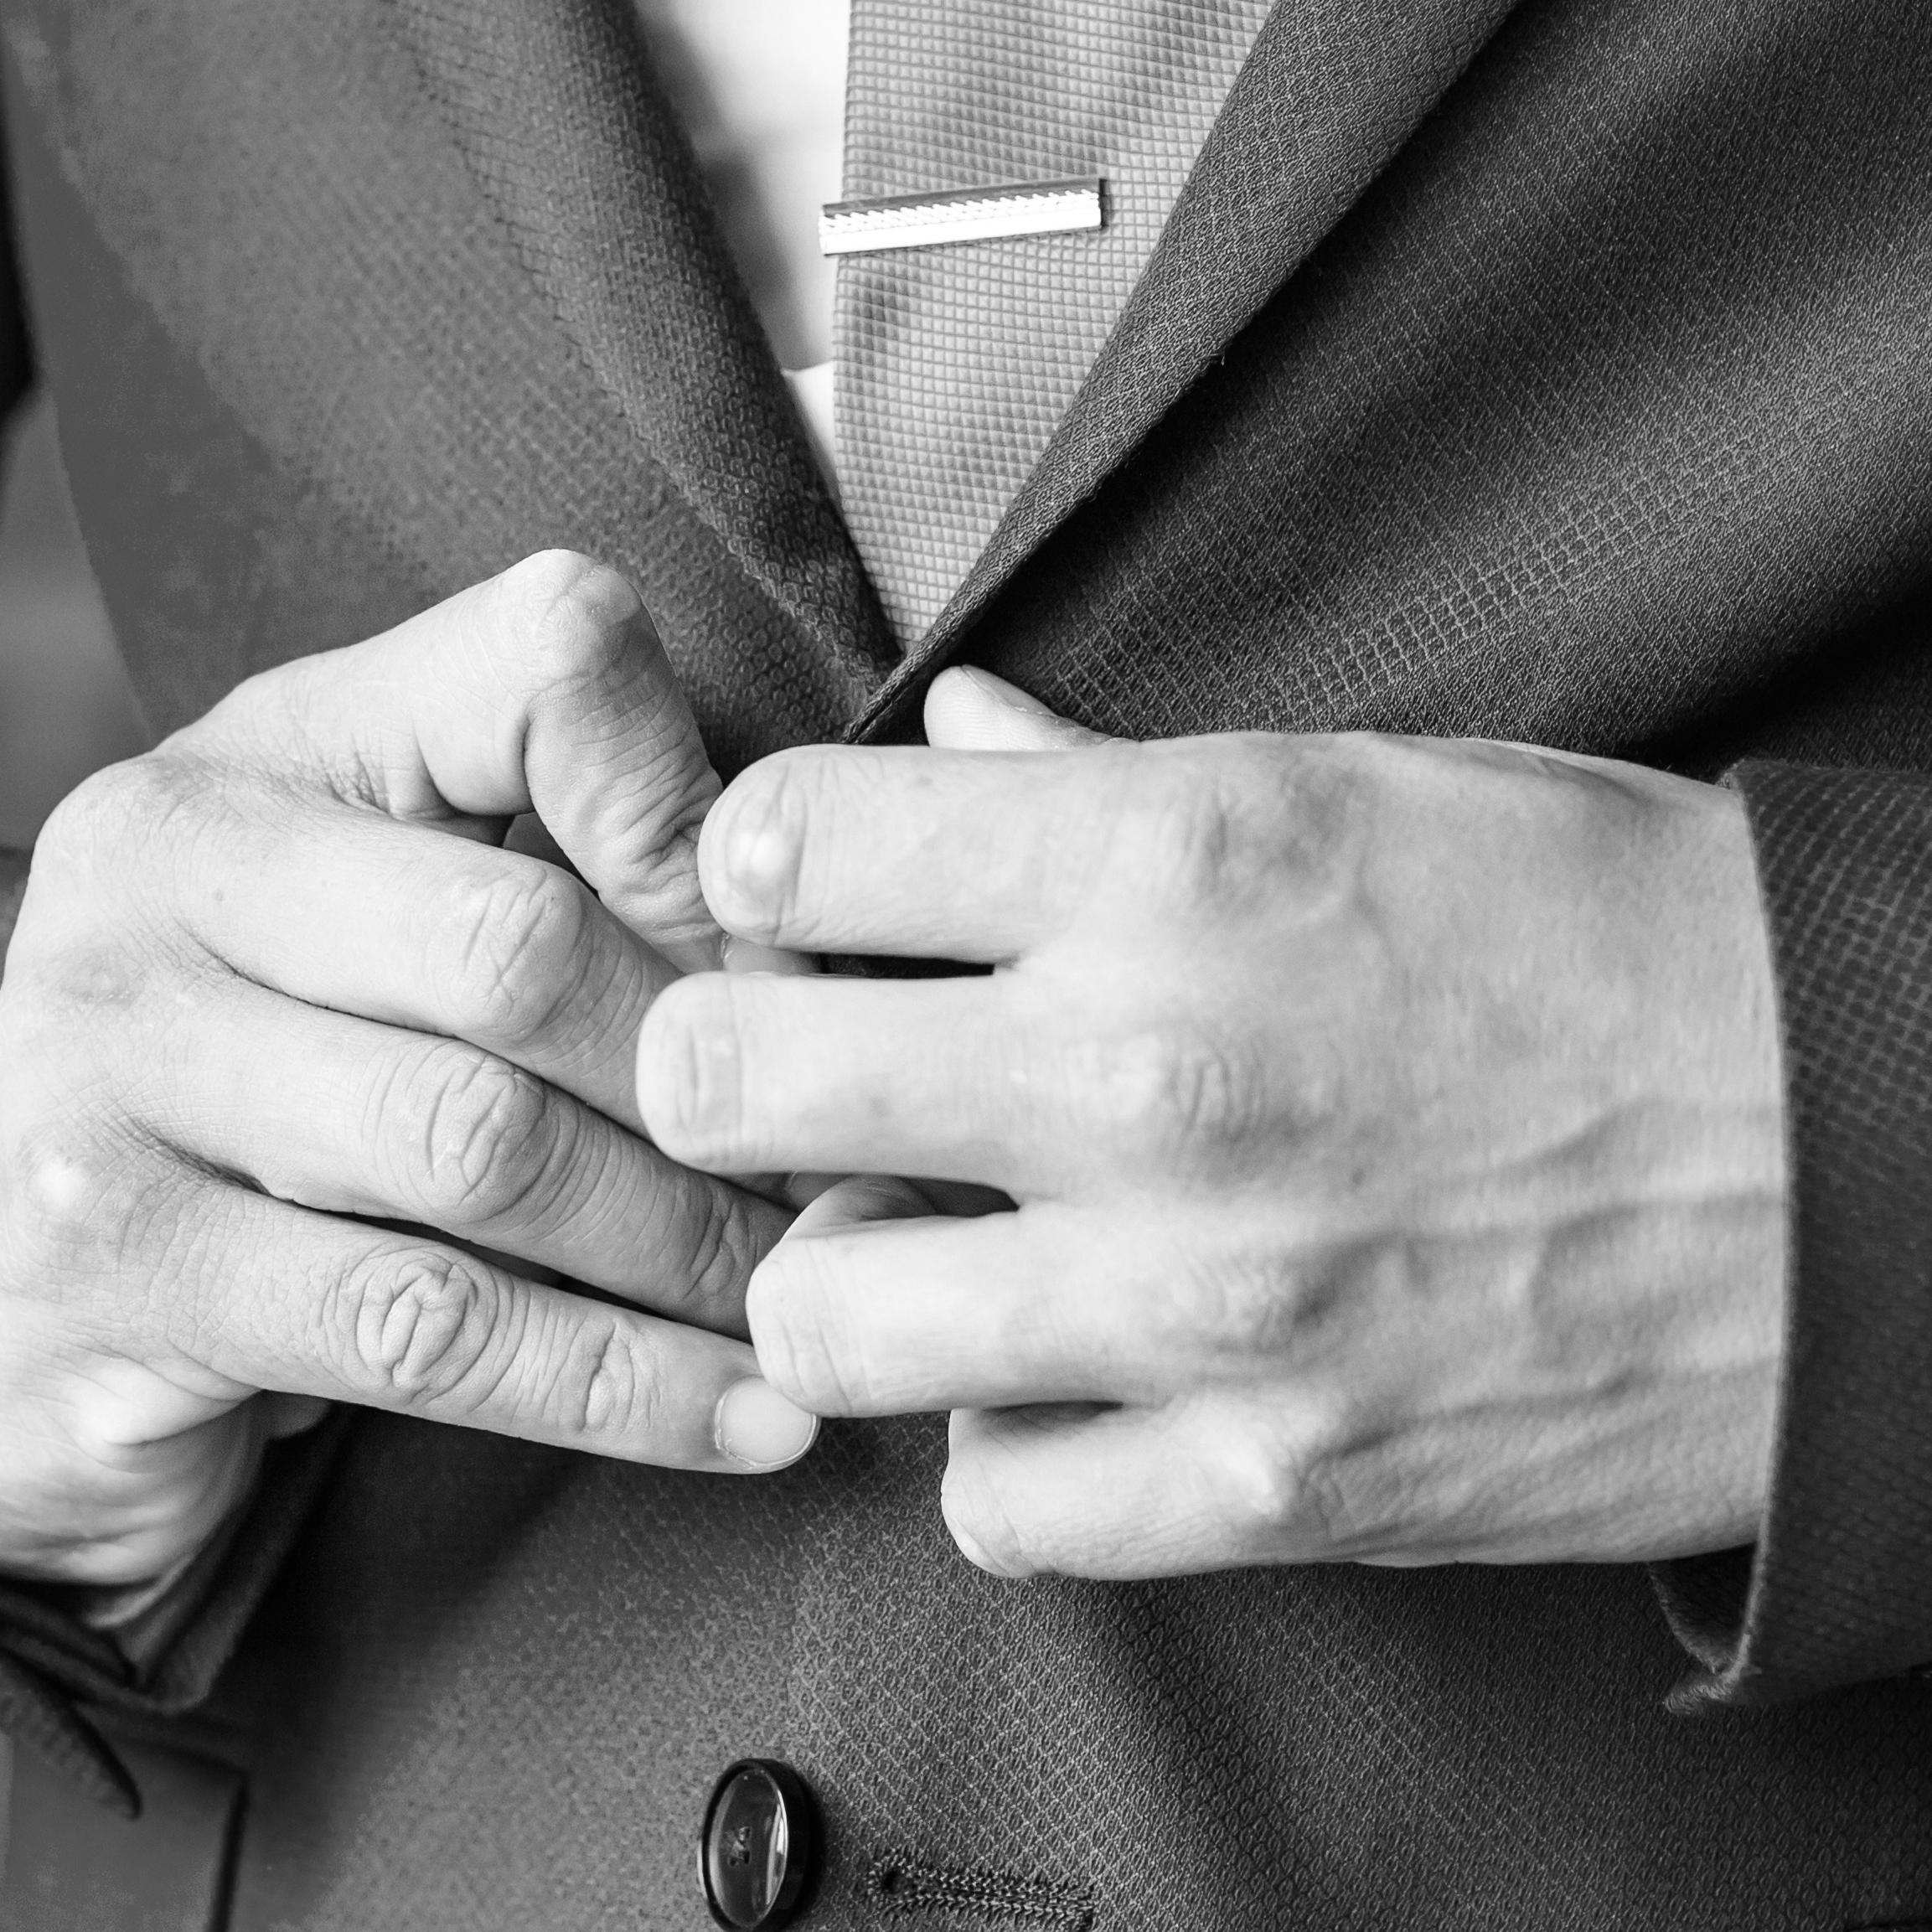 man-buttoning-jacket-close-up-PALE2W4.jpg